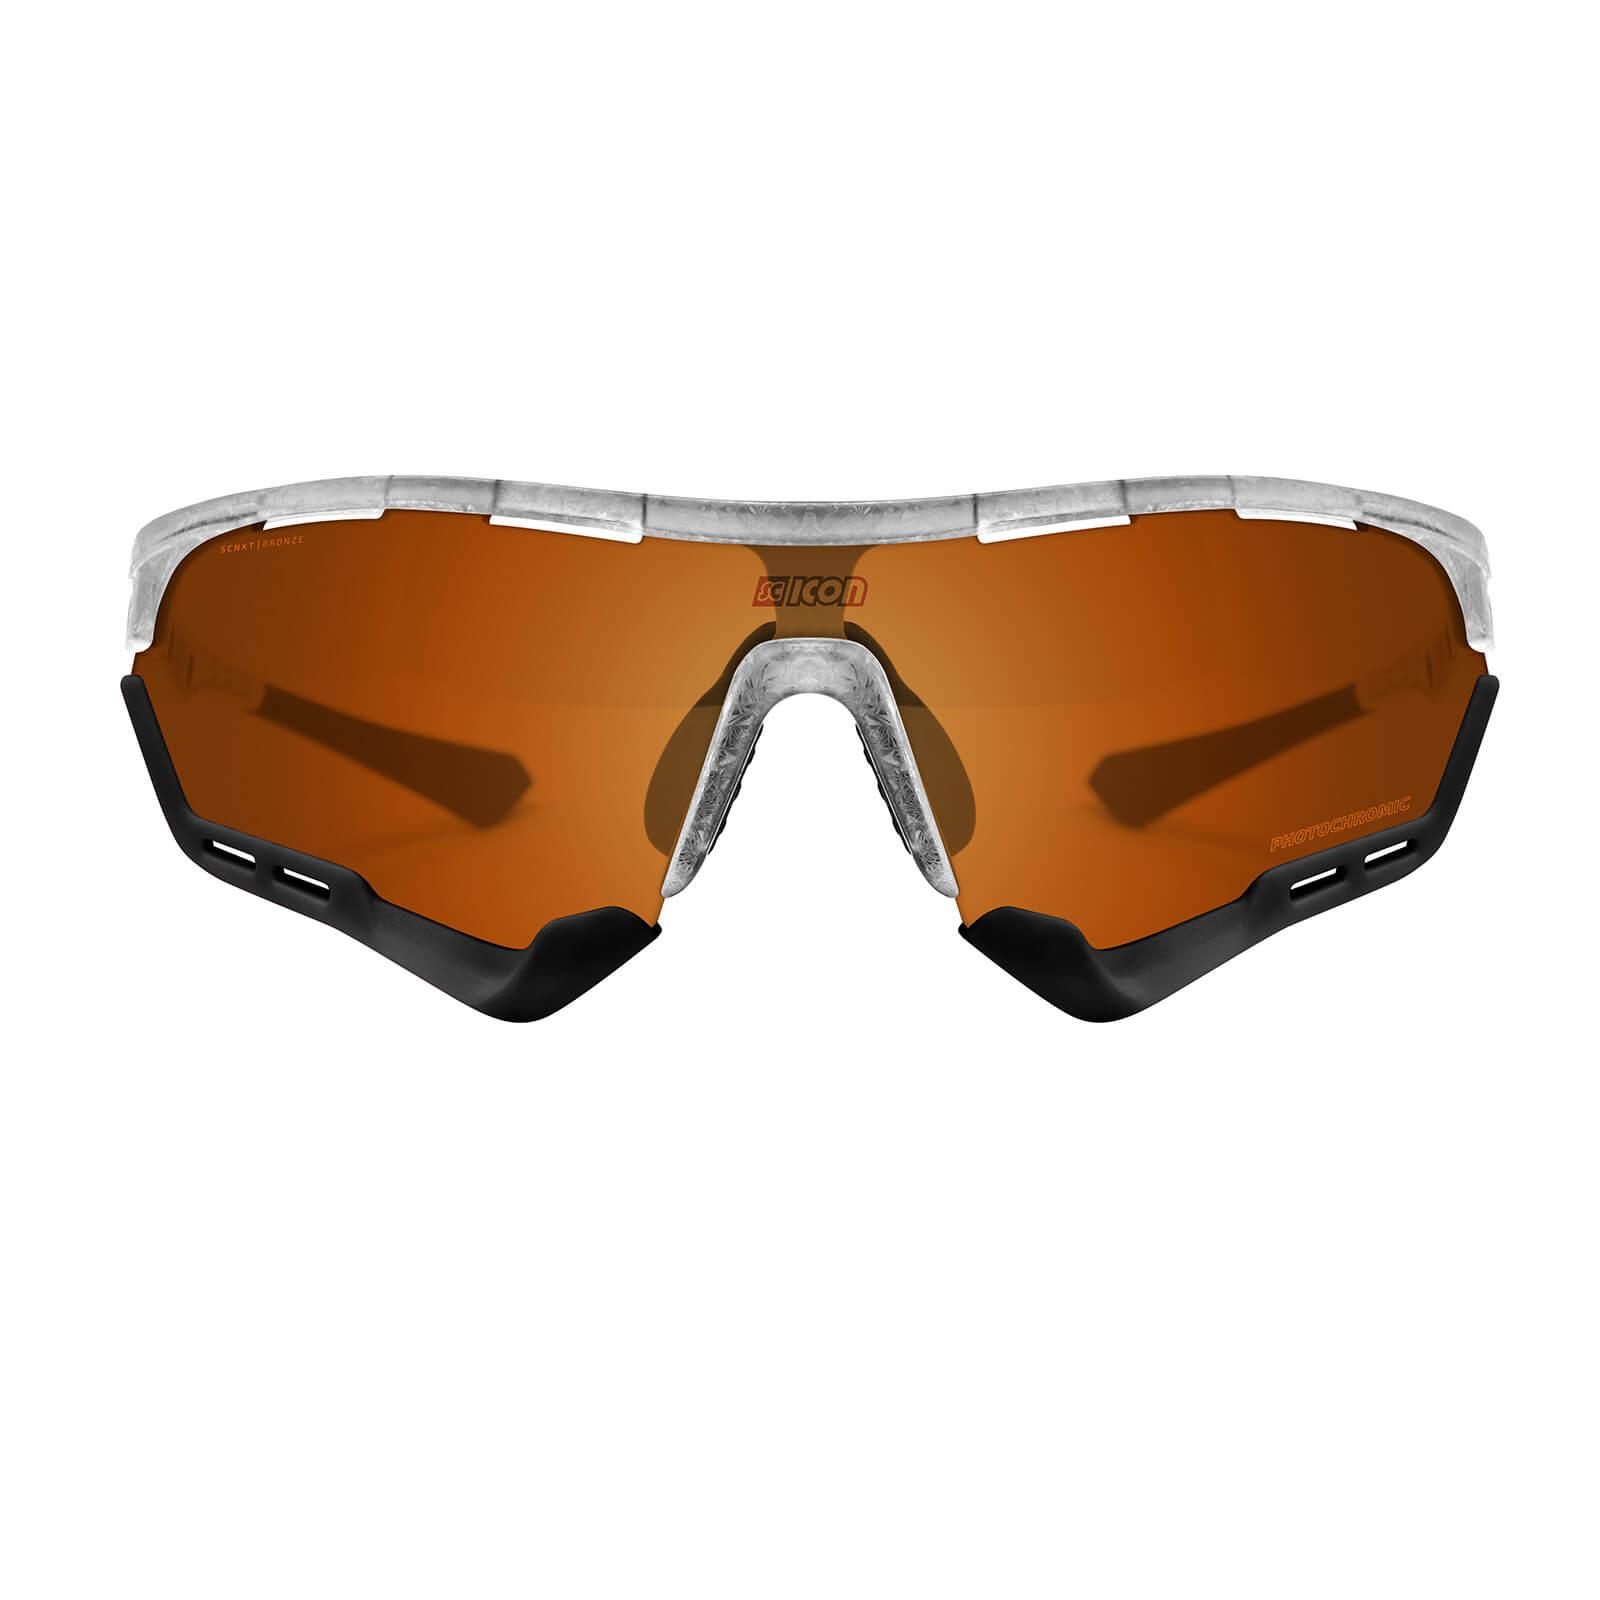 Scicon Aerotech Sunglasses SCN-XT Photochromic Bronze Mirror Lens - Frozen Matt Frame - XL Lens